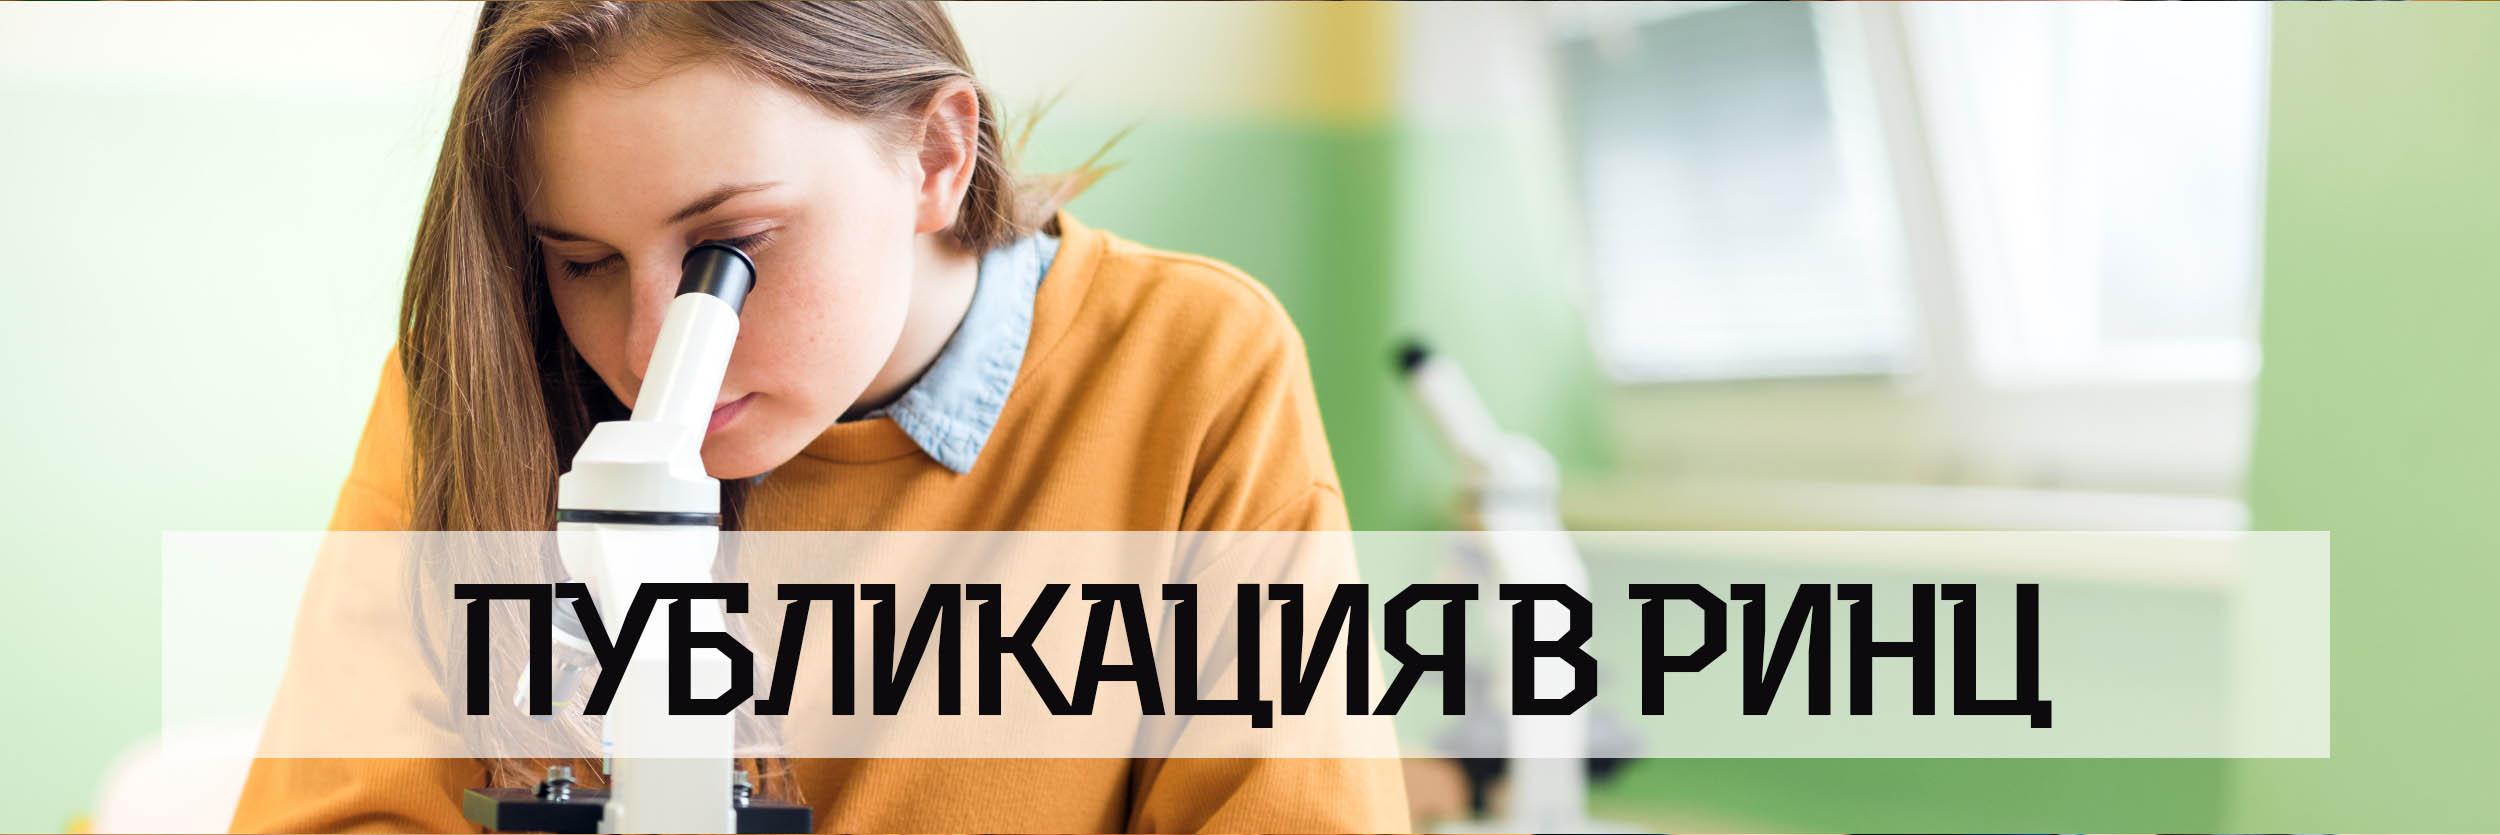 publikacia_v_rinc.jpg